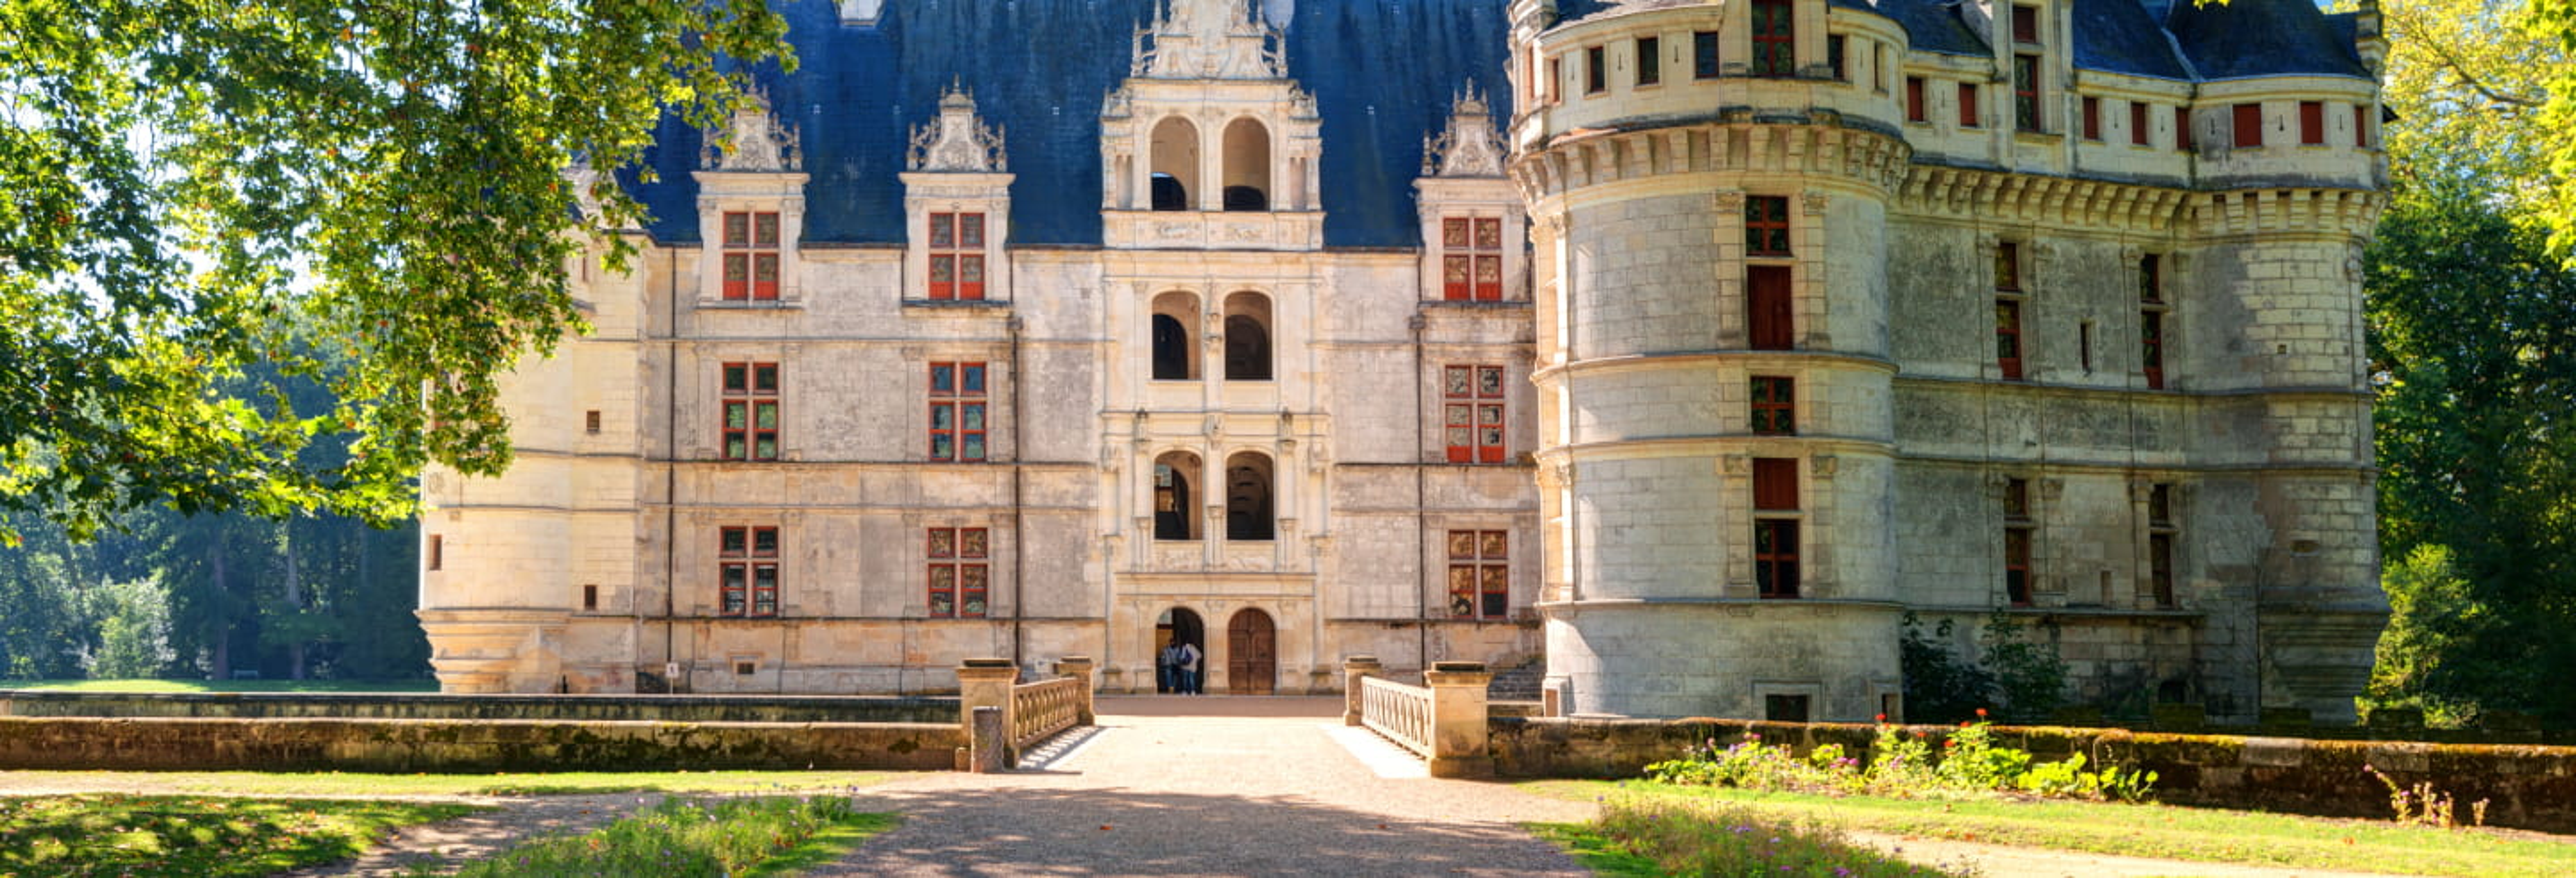 Château Azay-le-Rideau Tickets